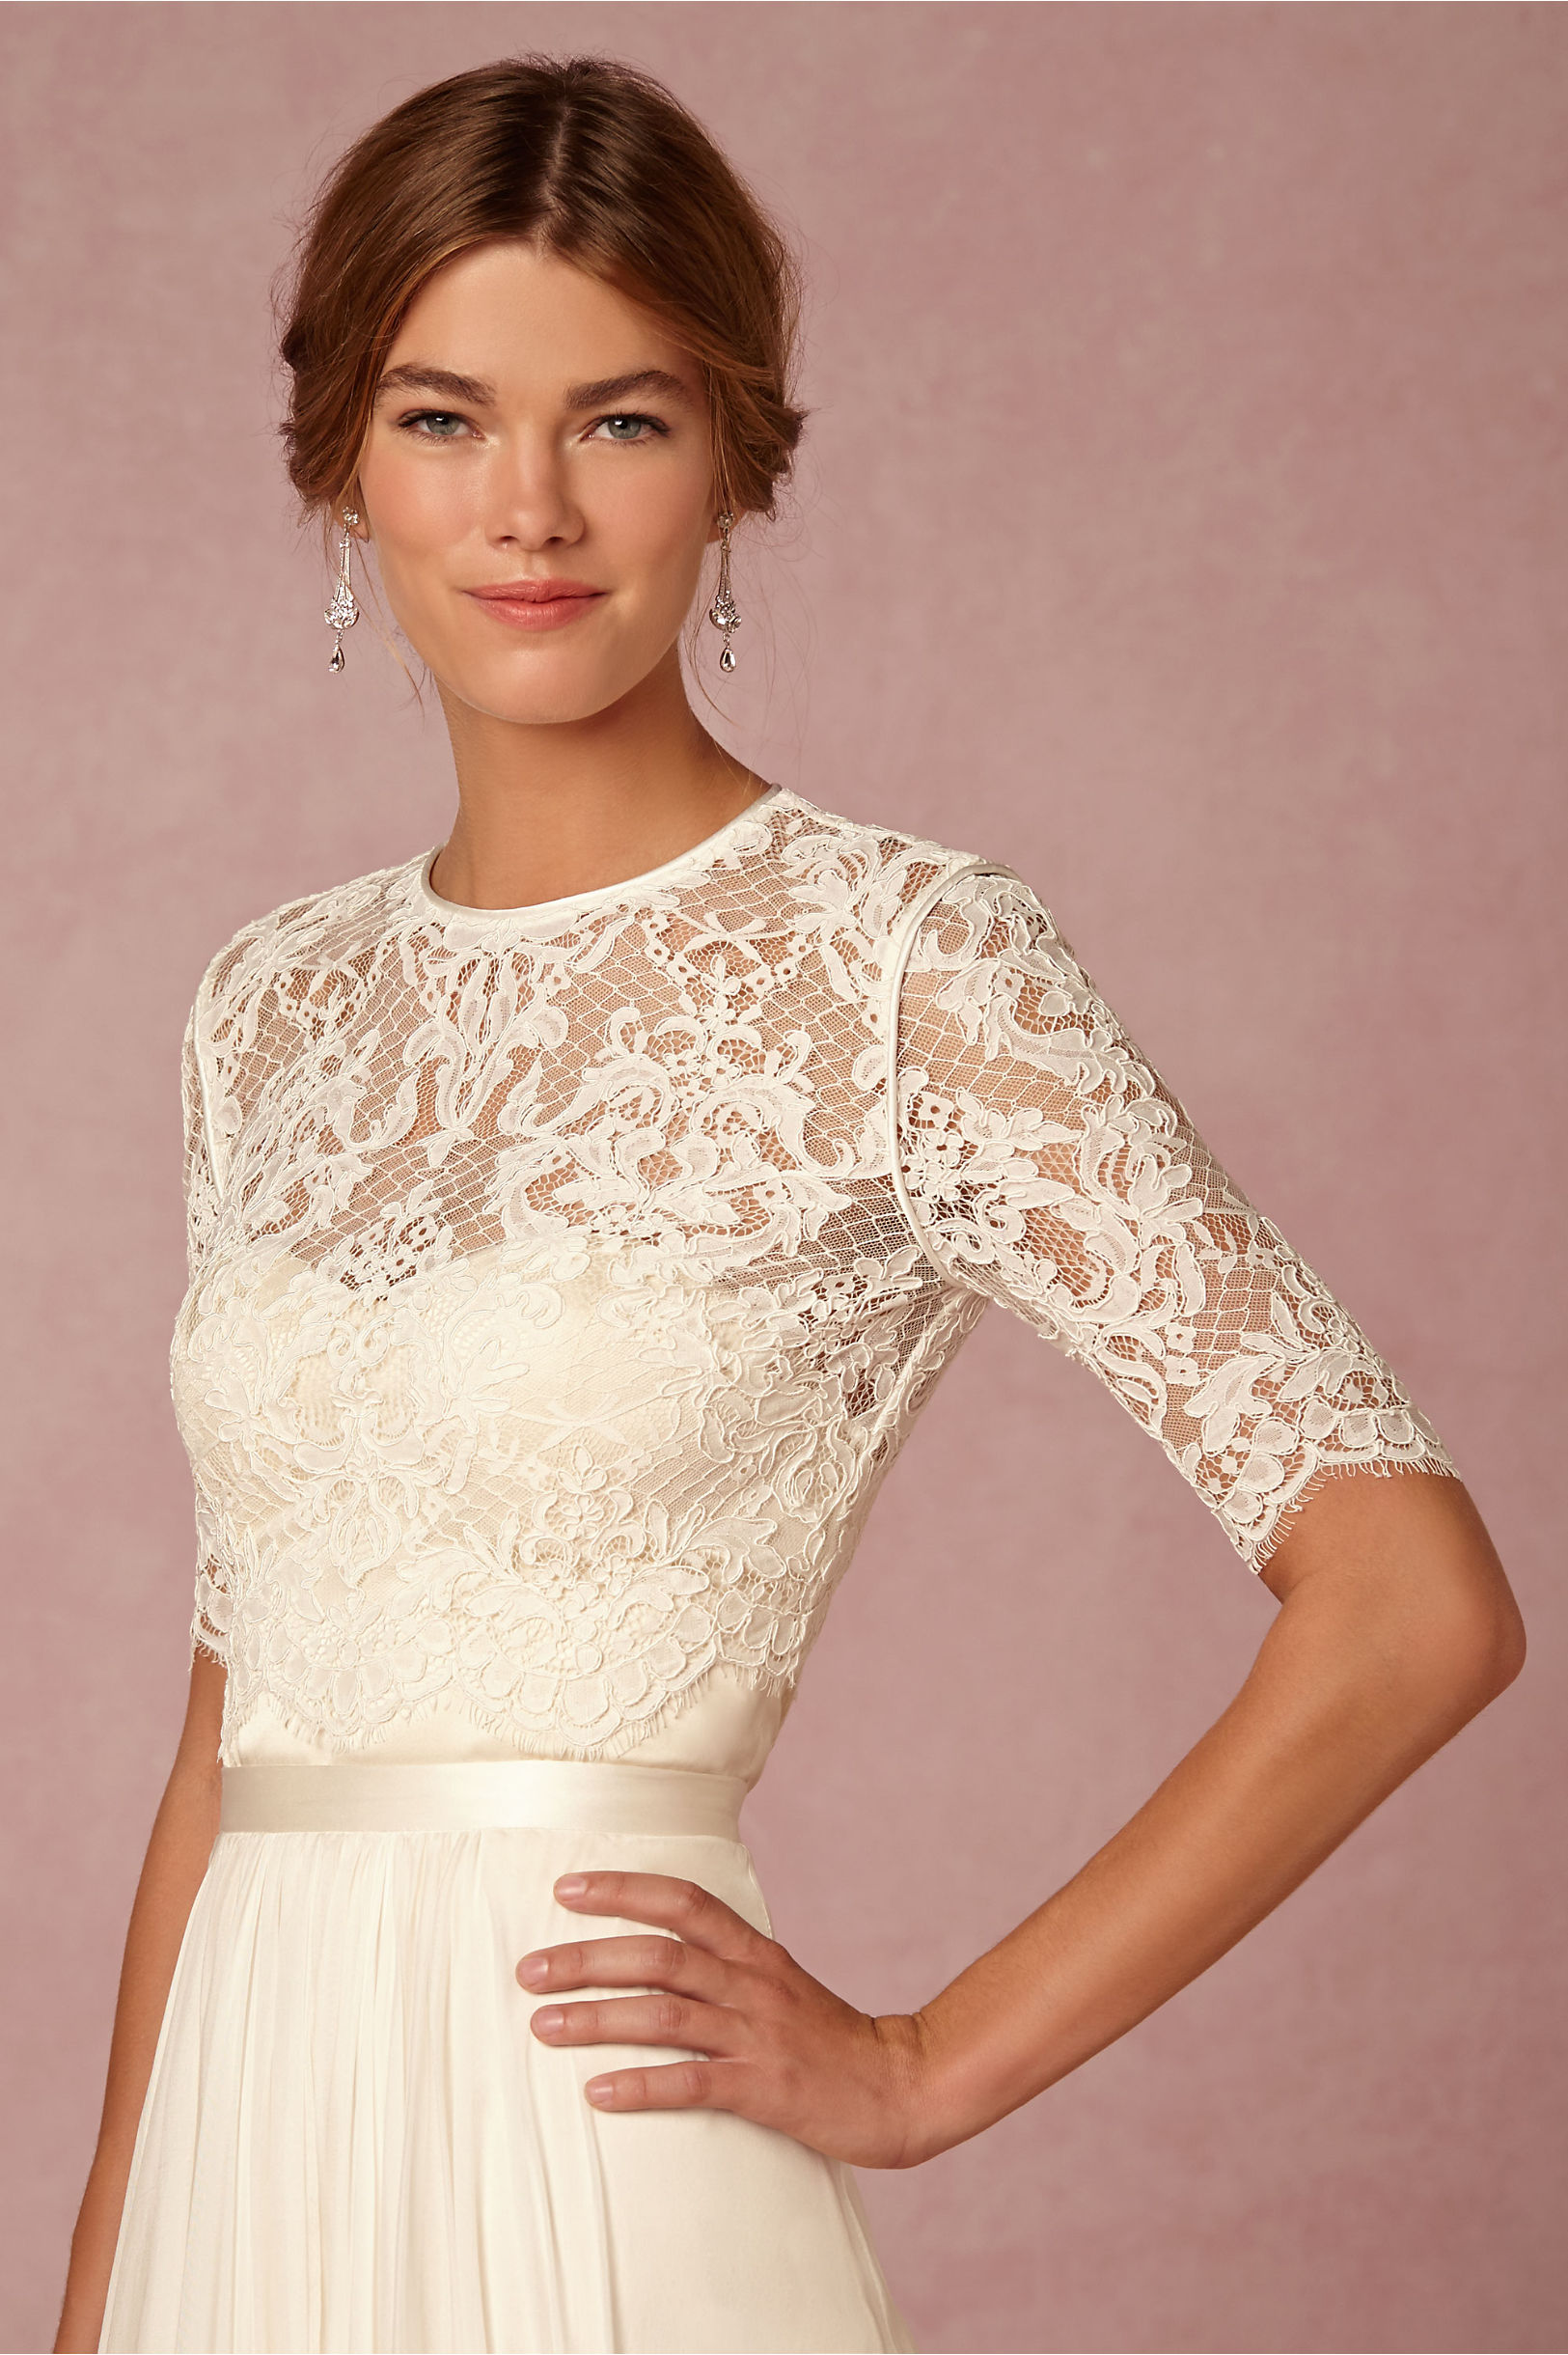 80ae6f07c3 Wedding Dress Topper - Wedding Dress   Decore Ideas